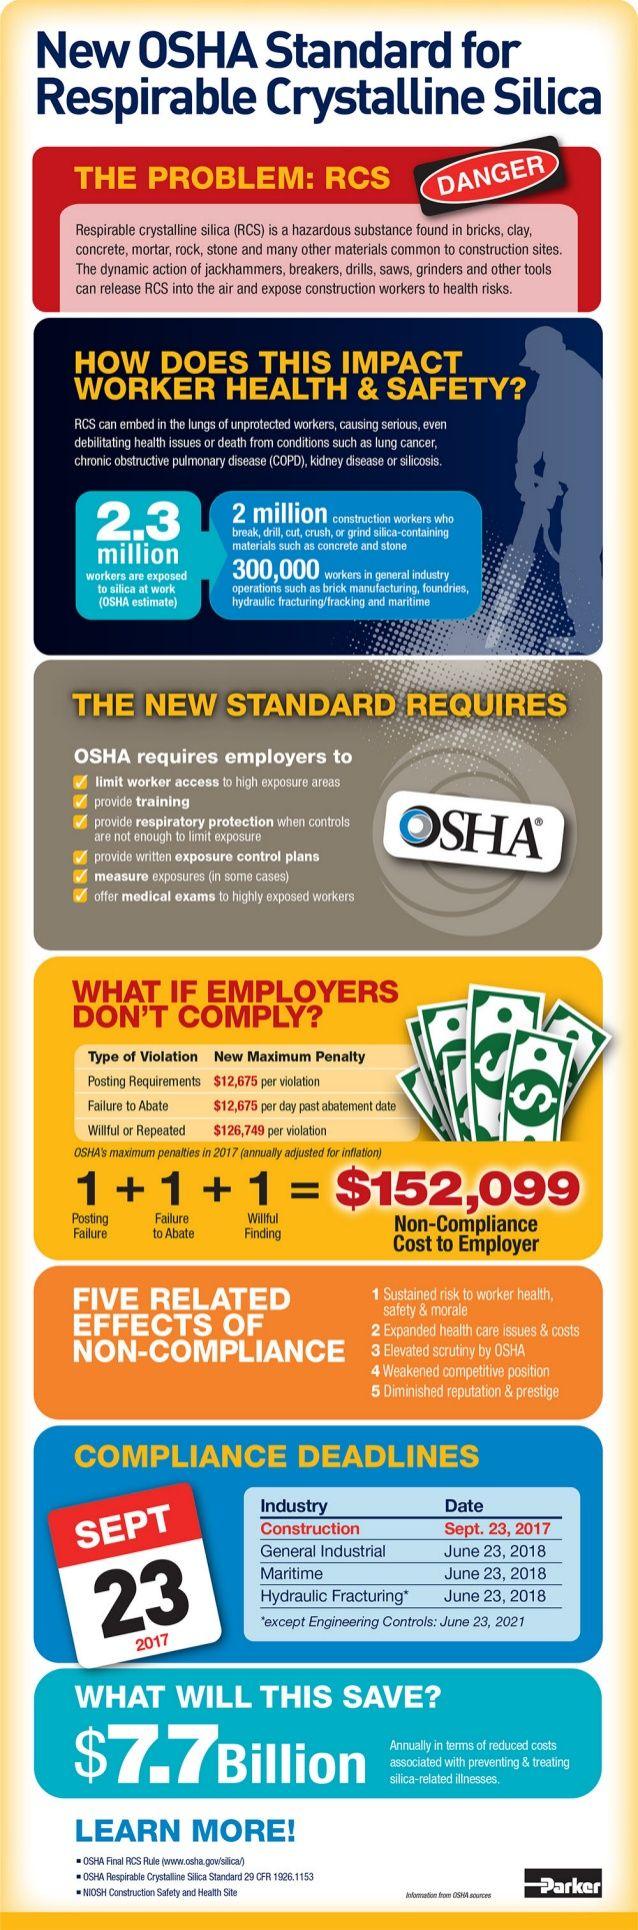 New OSHA Standard for Respirable Crystalline Silica (RCS